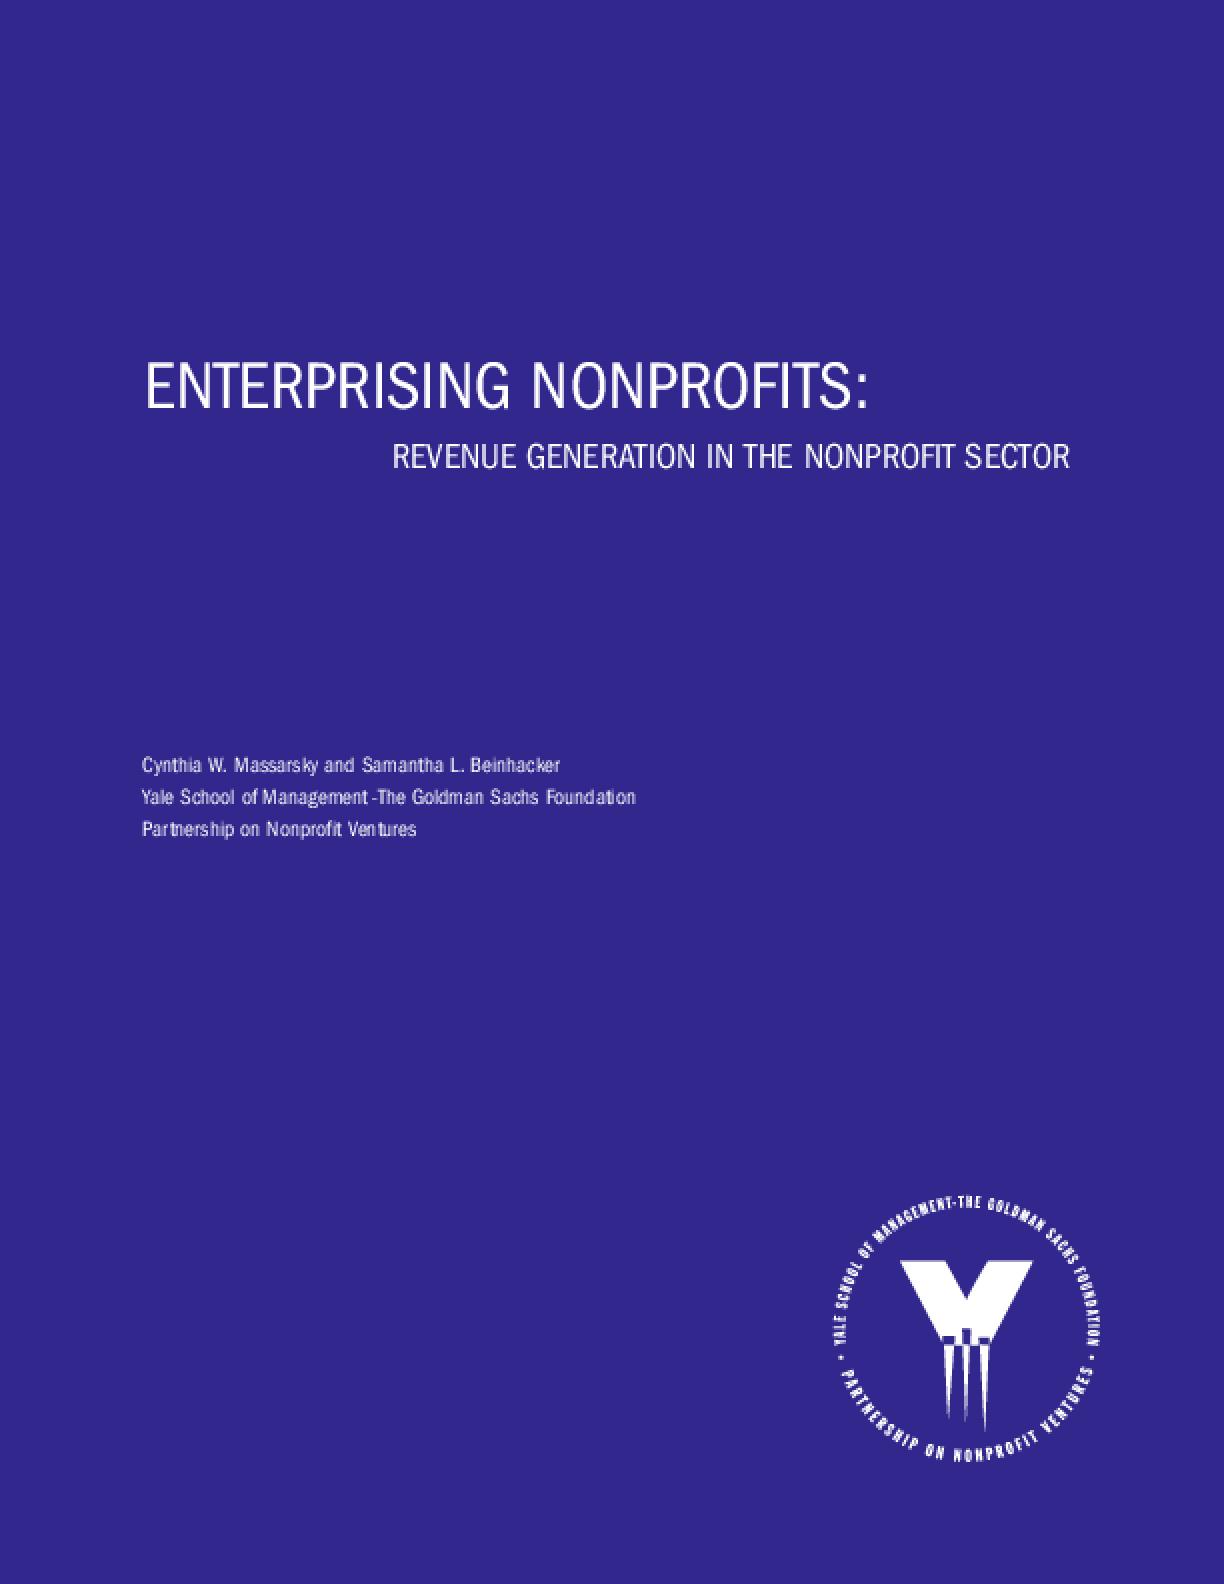 Enterprising Nonprofits: Revenue Generation in the Nonprofit Sector